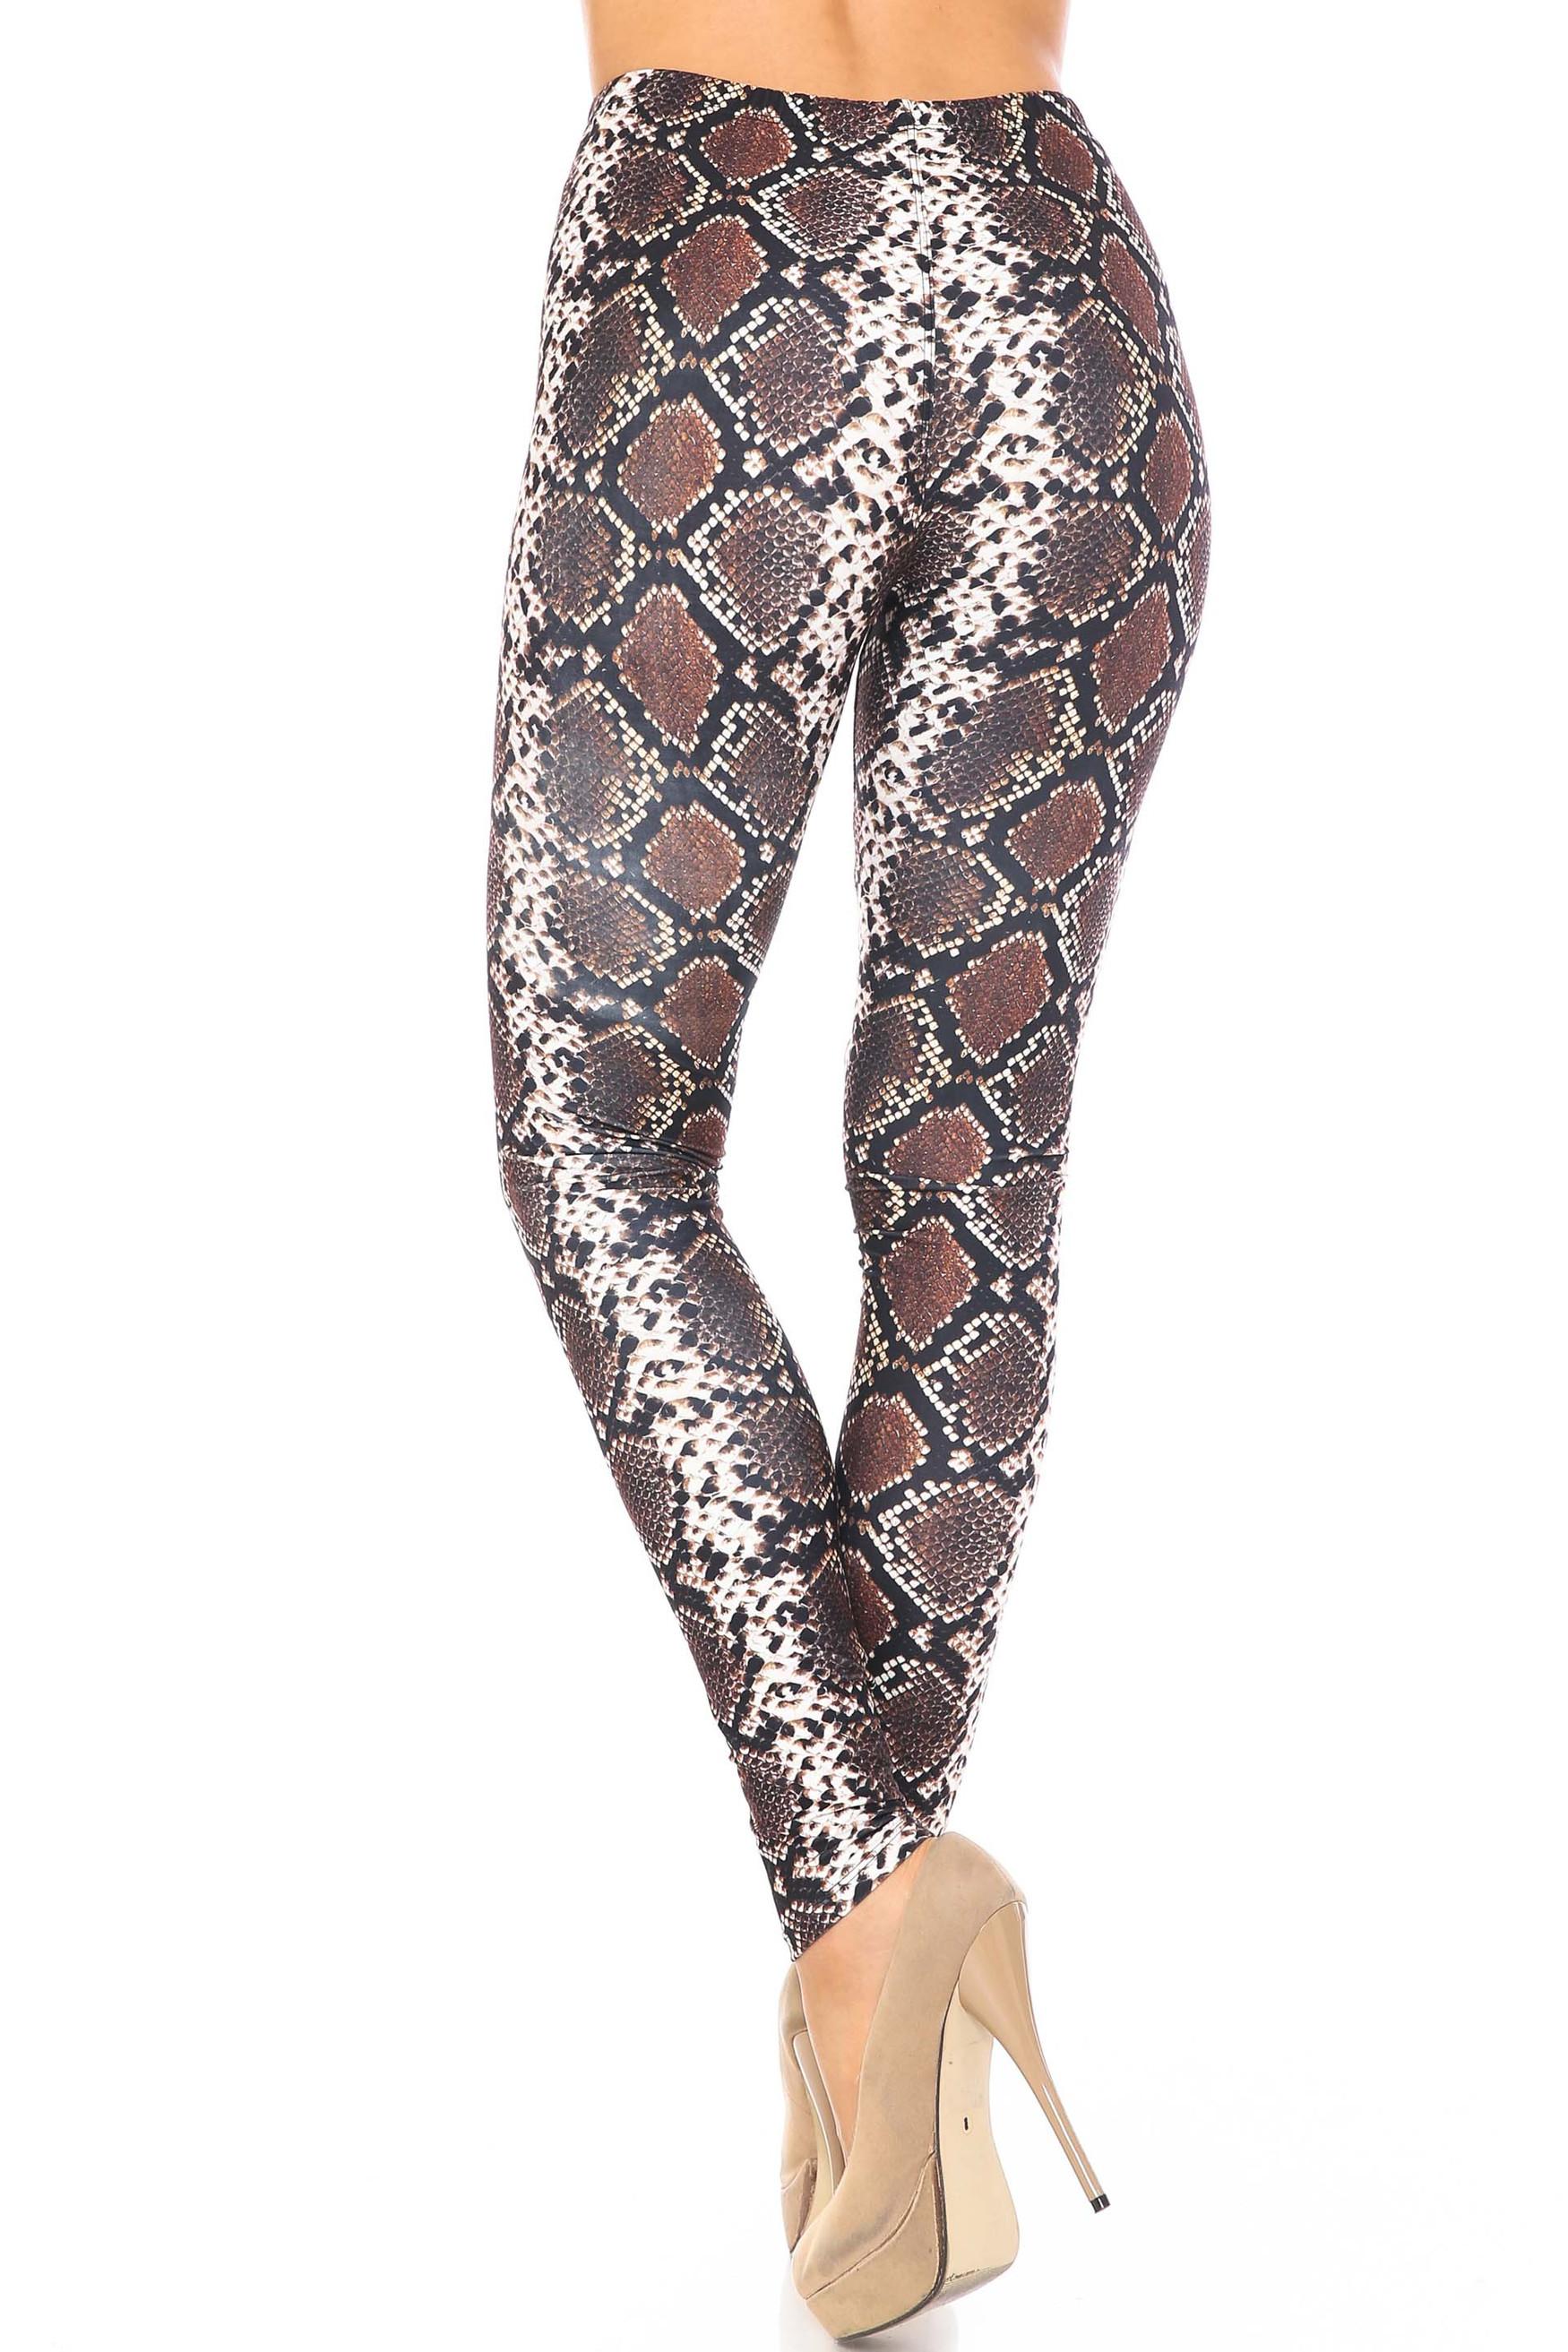 Back side image of Creamy Soft  Brown Boa Snake Plus Size Leggings - USA Fashion™